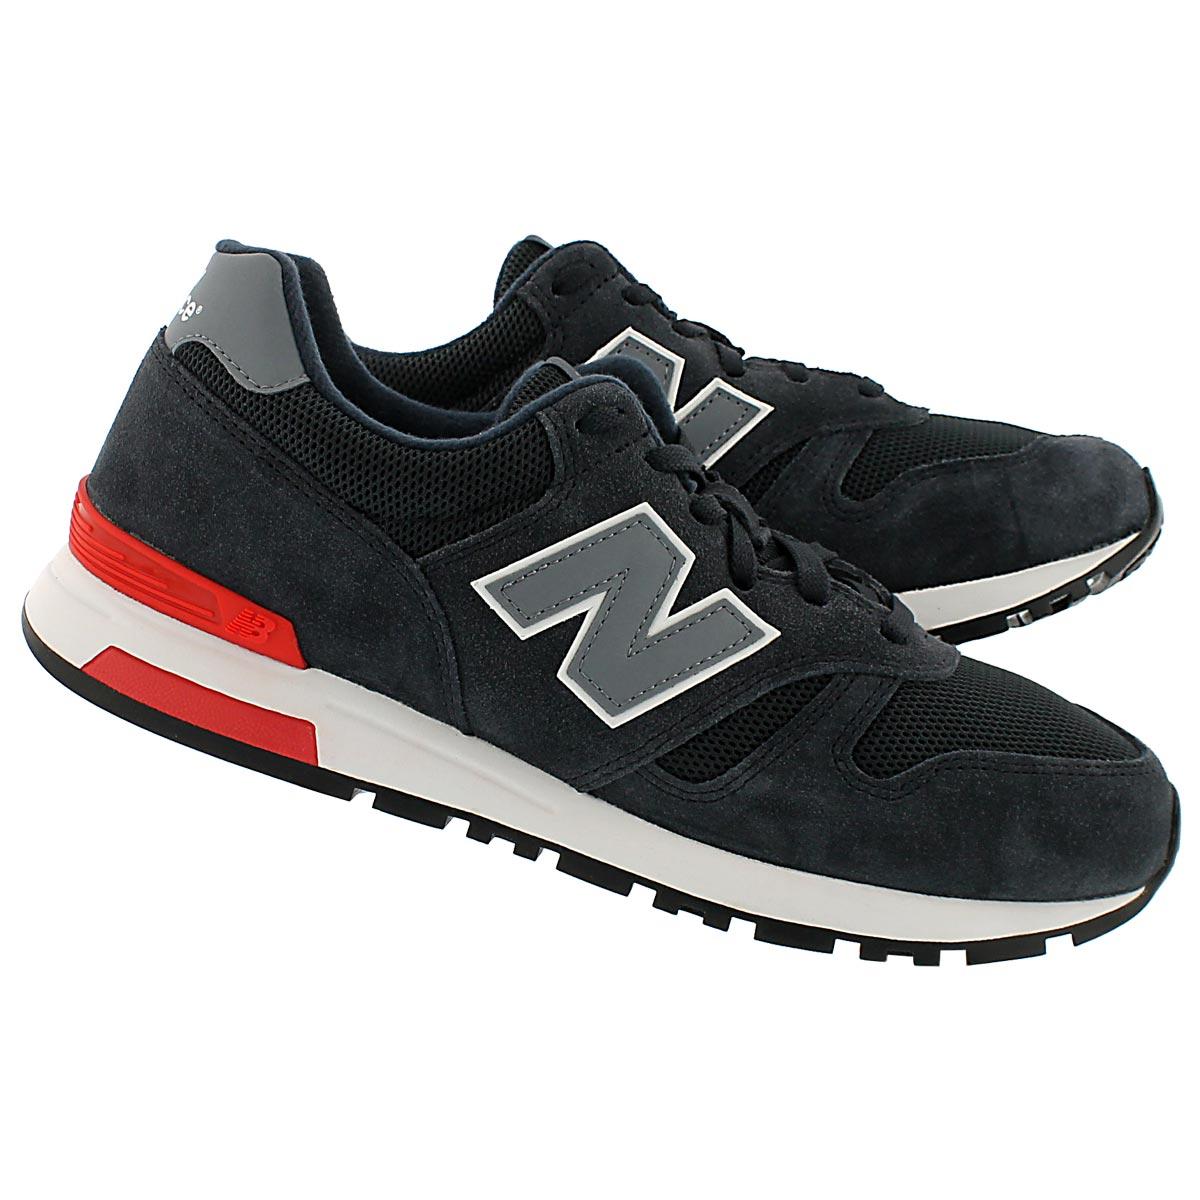 Chaussure de course 565, marine/gris hom